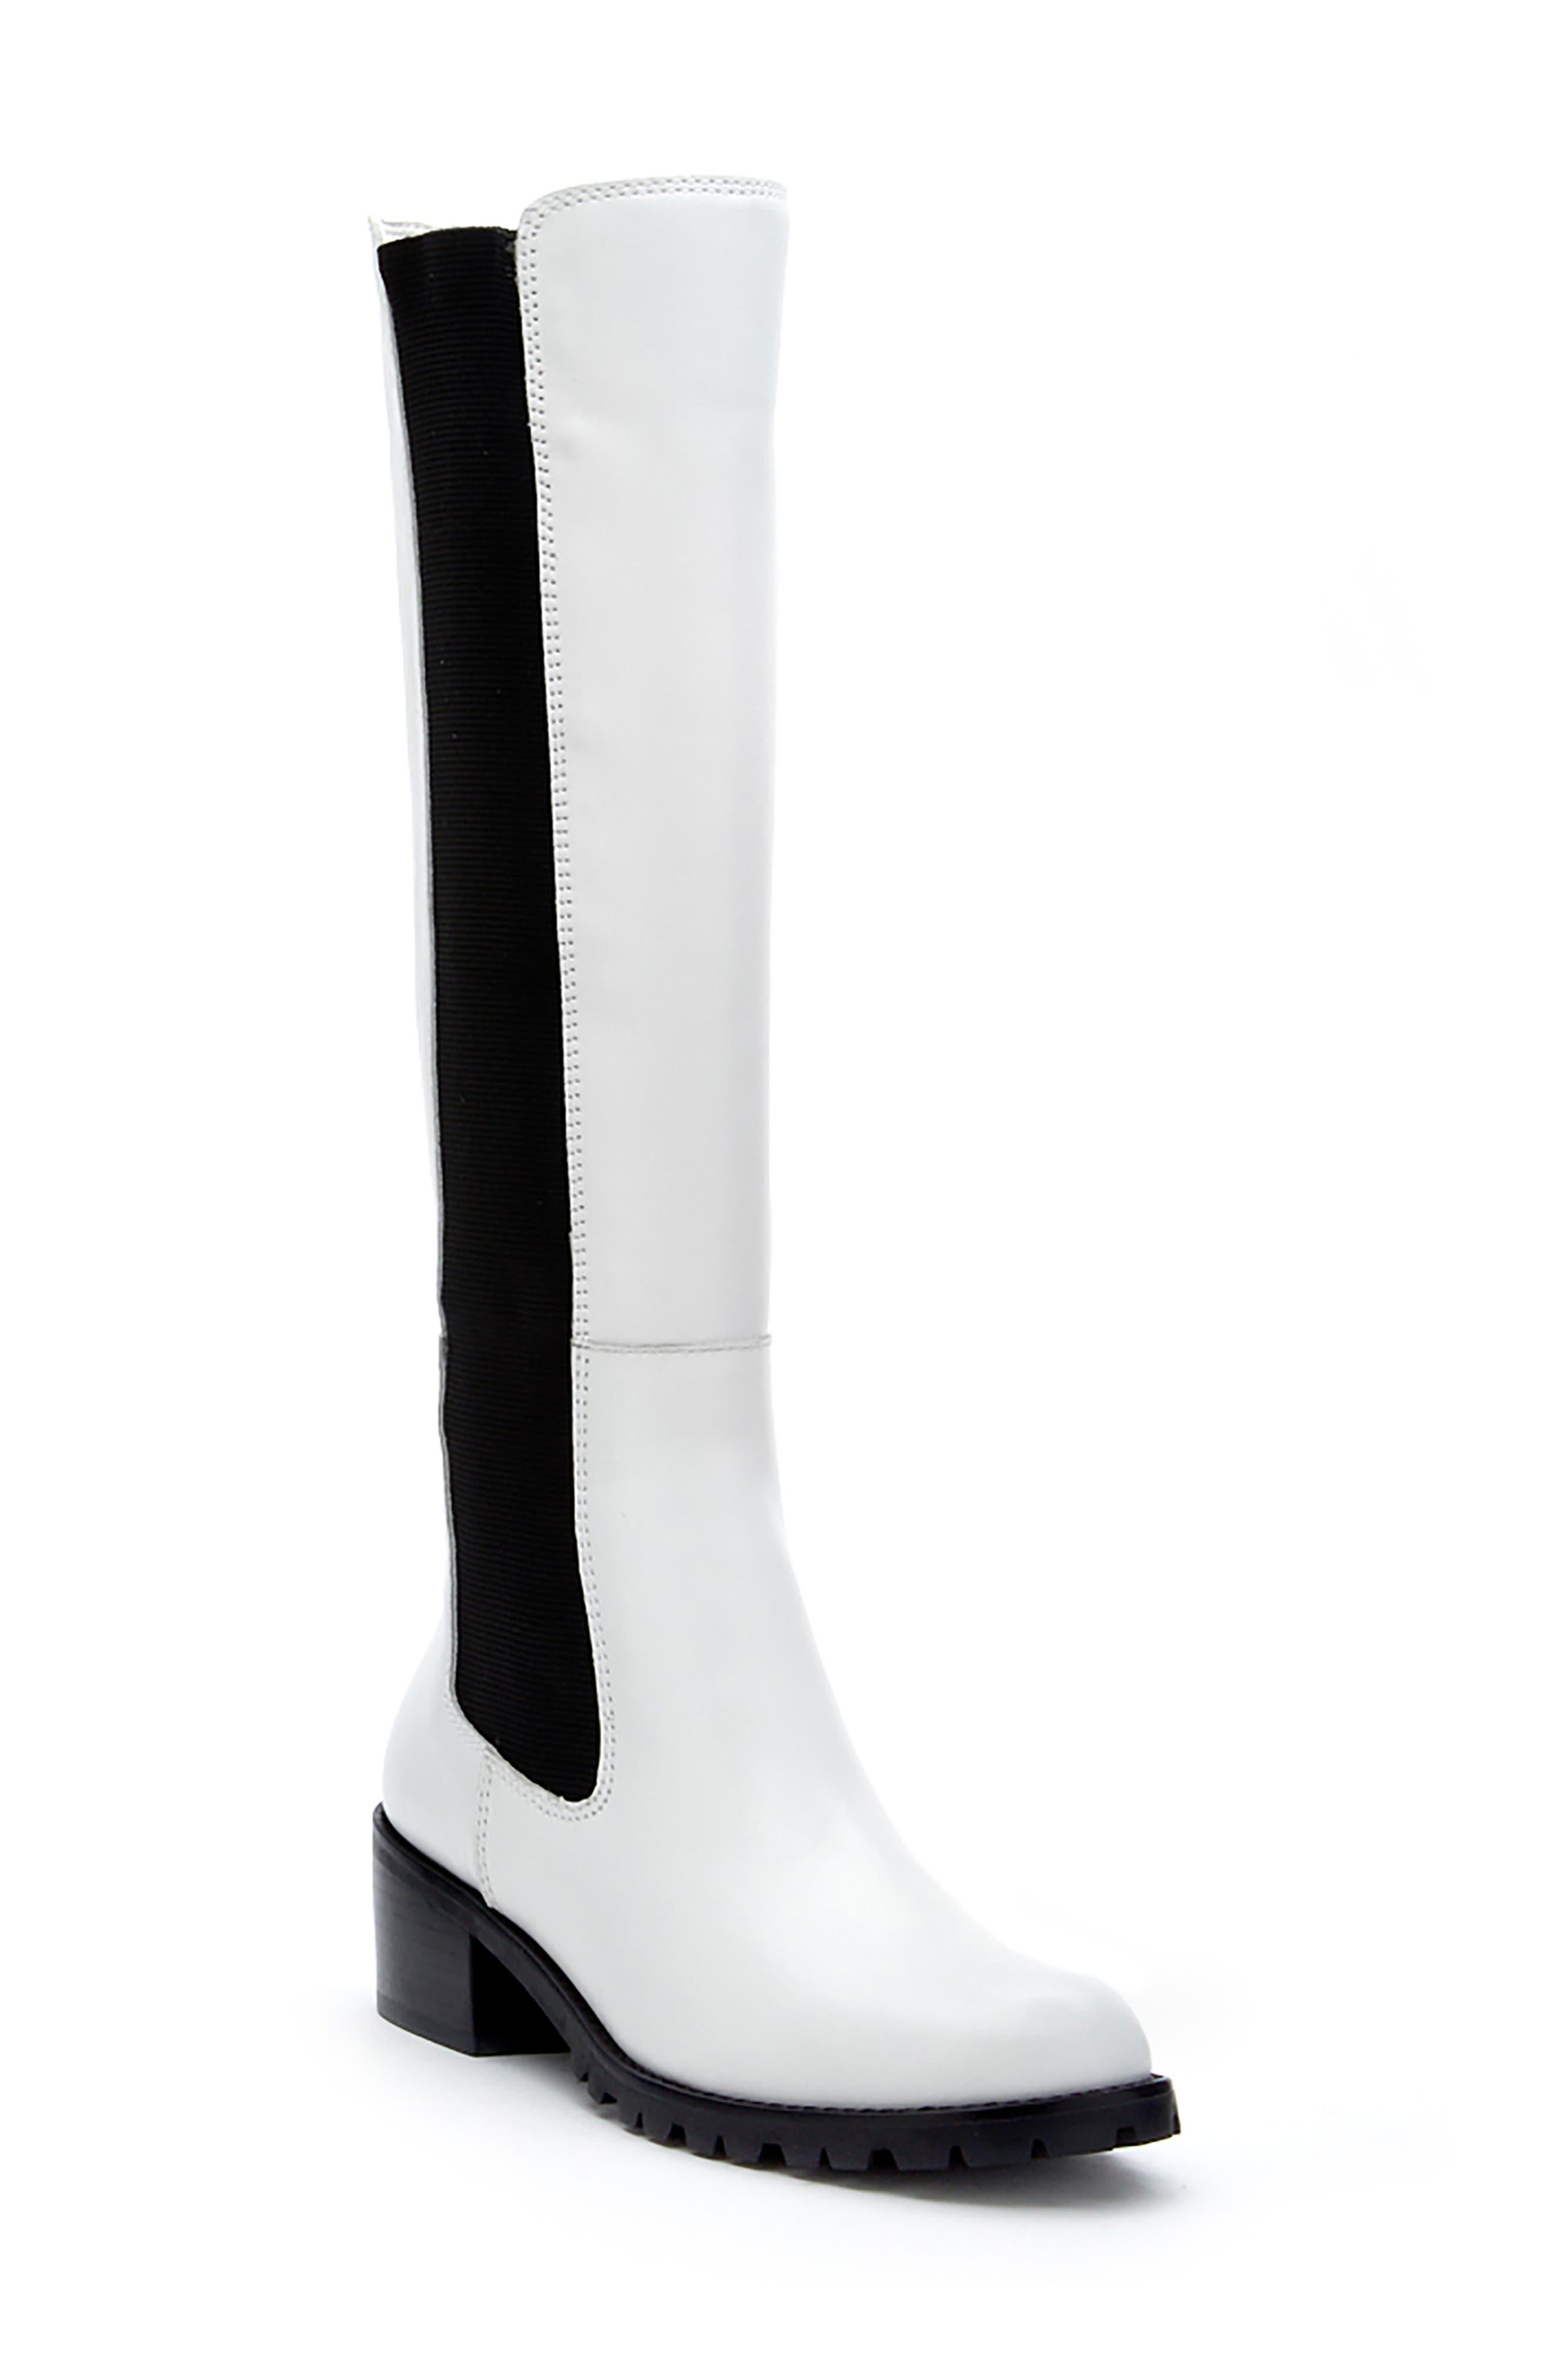 Ryder Knee High Chelsea Boot